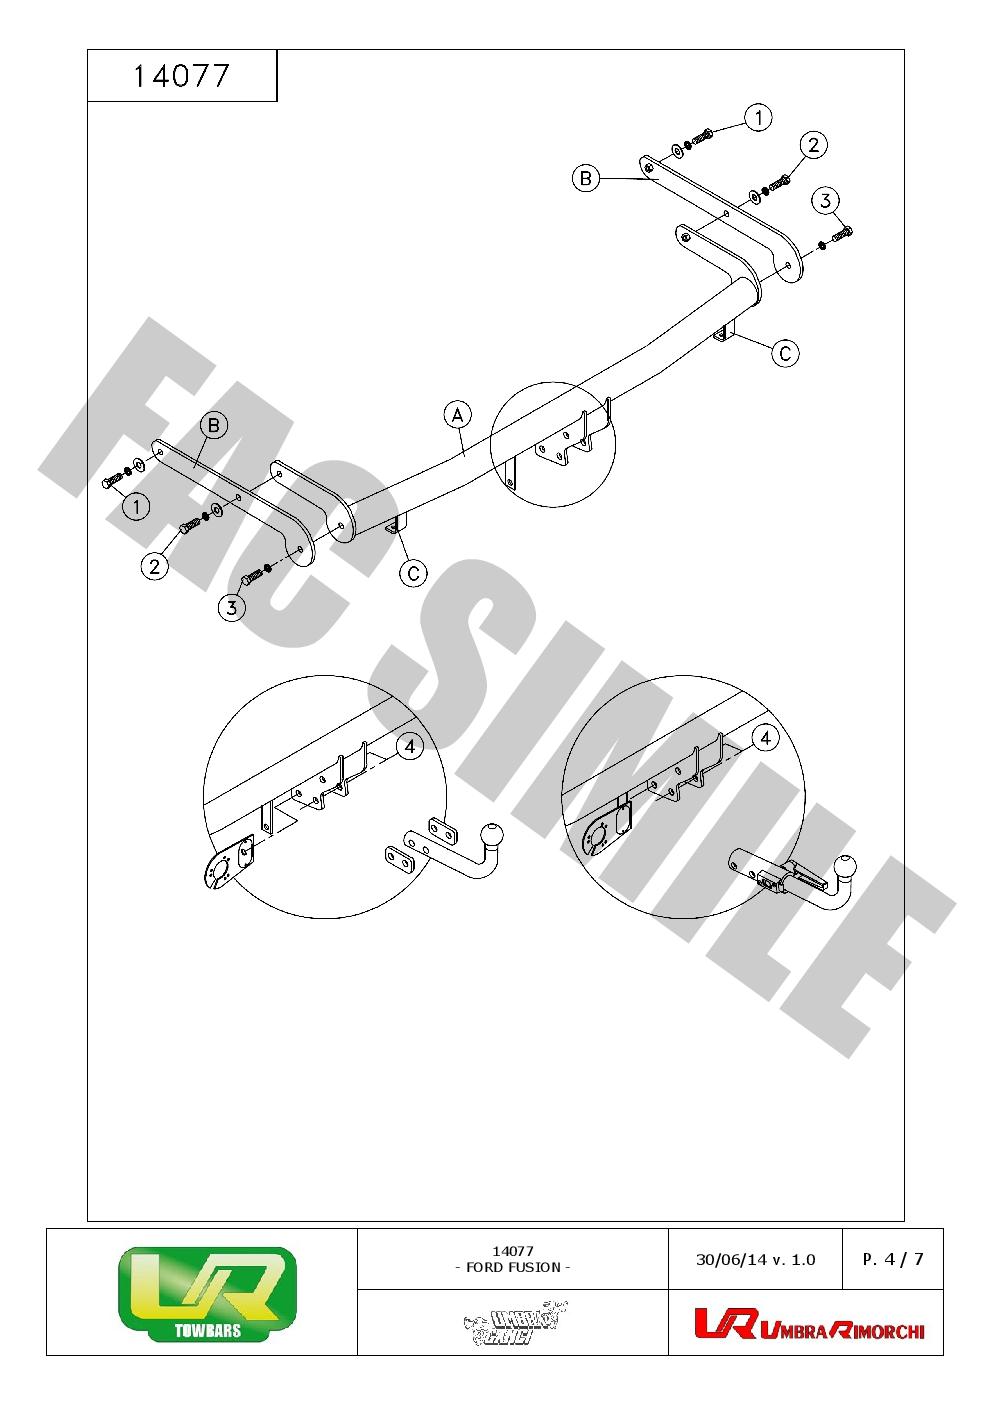 7p E-Satz Ford Fusion Kombi 2002-2005 1407/_A1 AHK Abnehmbare Anhängerkupplung